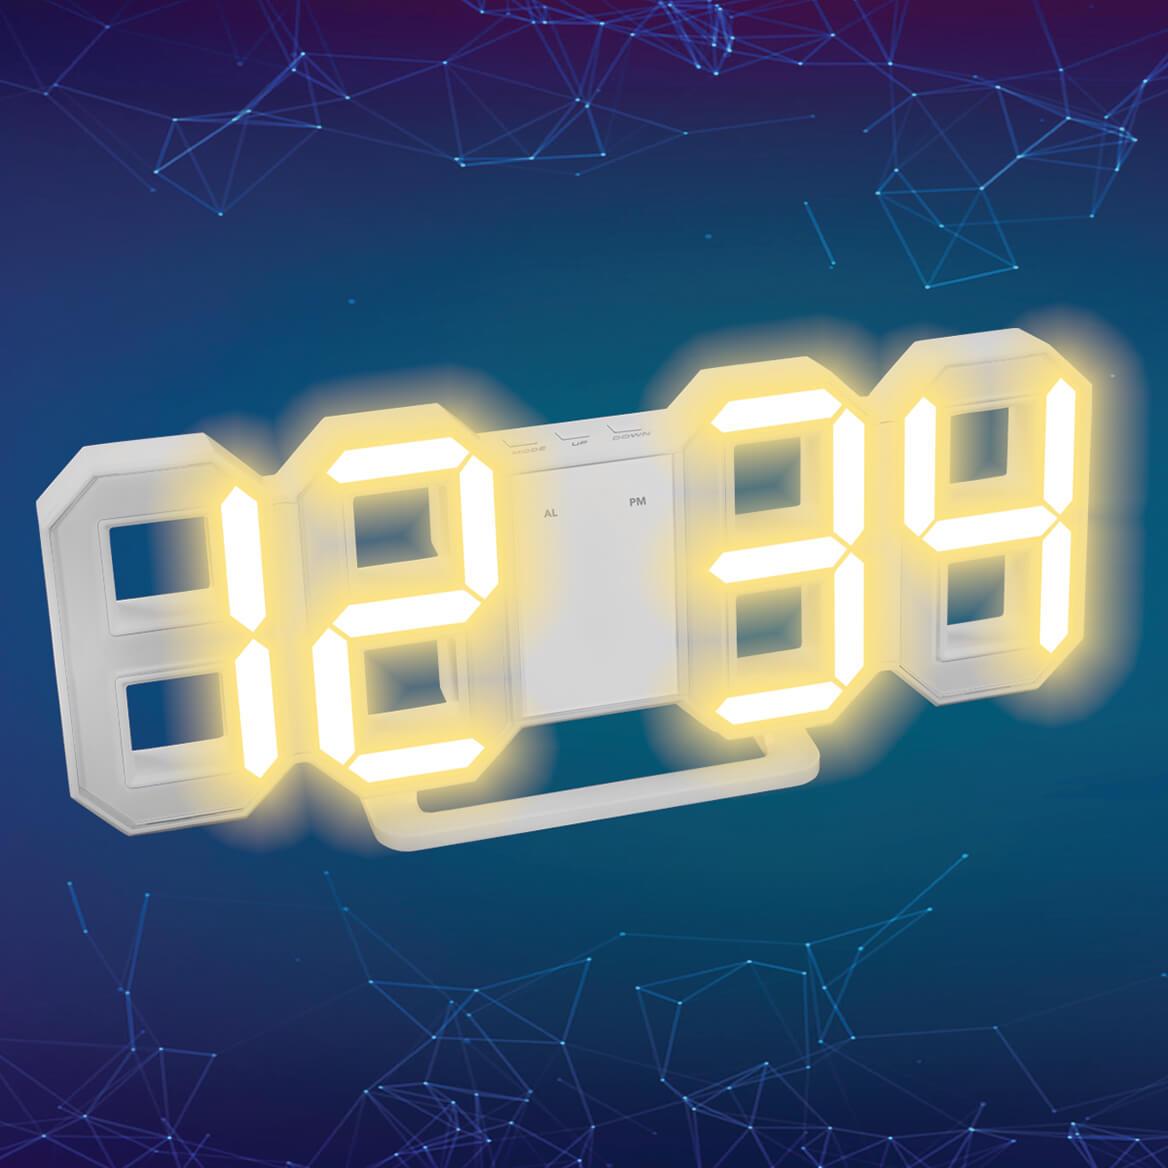 Future Tech Digital Clock-369747